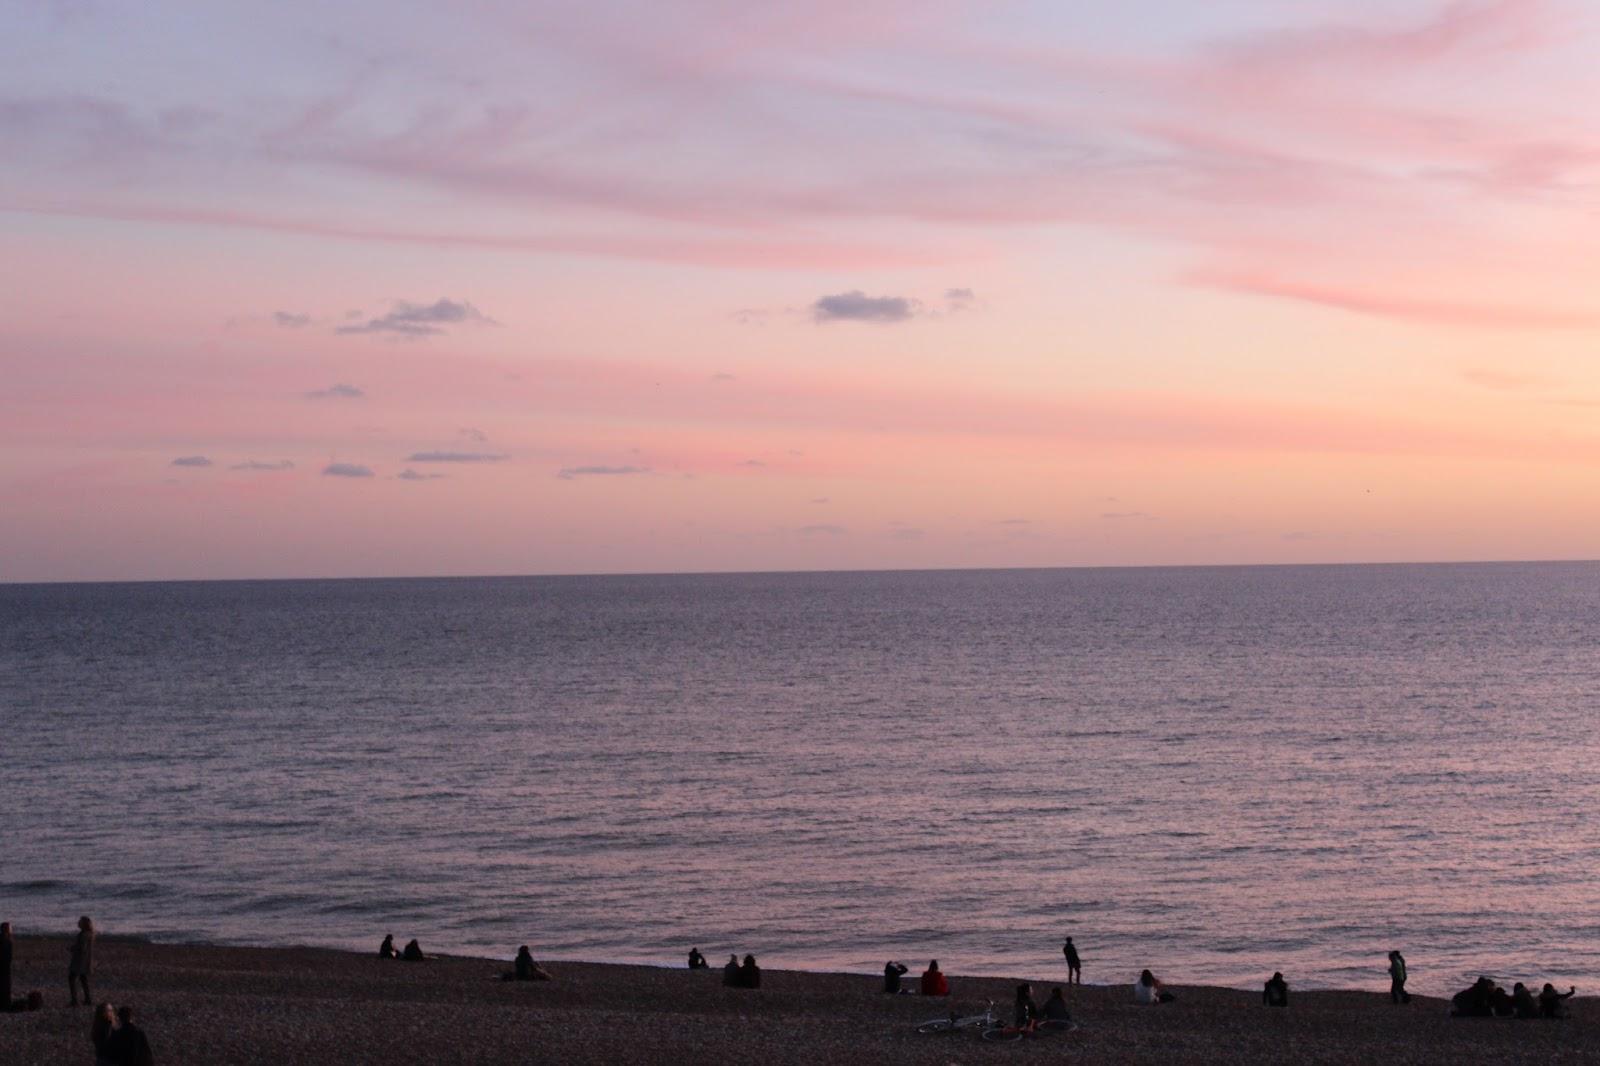 Brighton Beach Look Travel Guide City England Trip